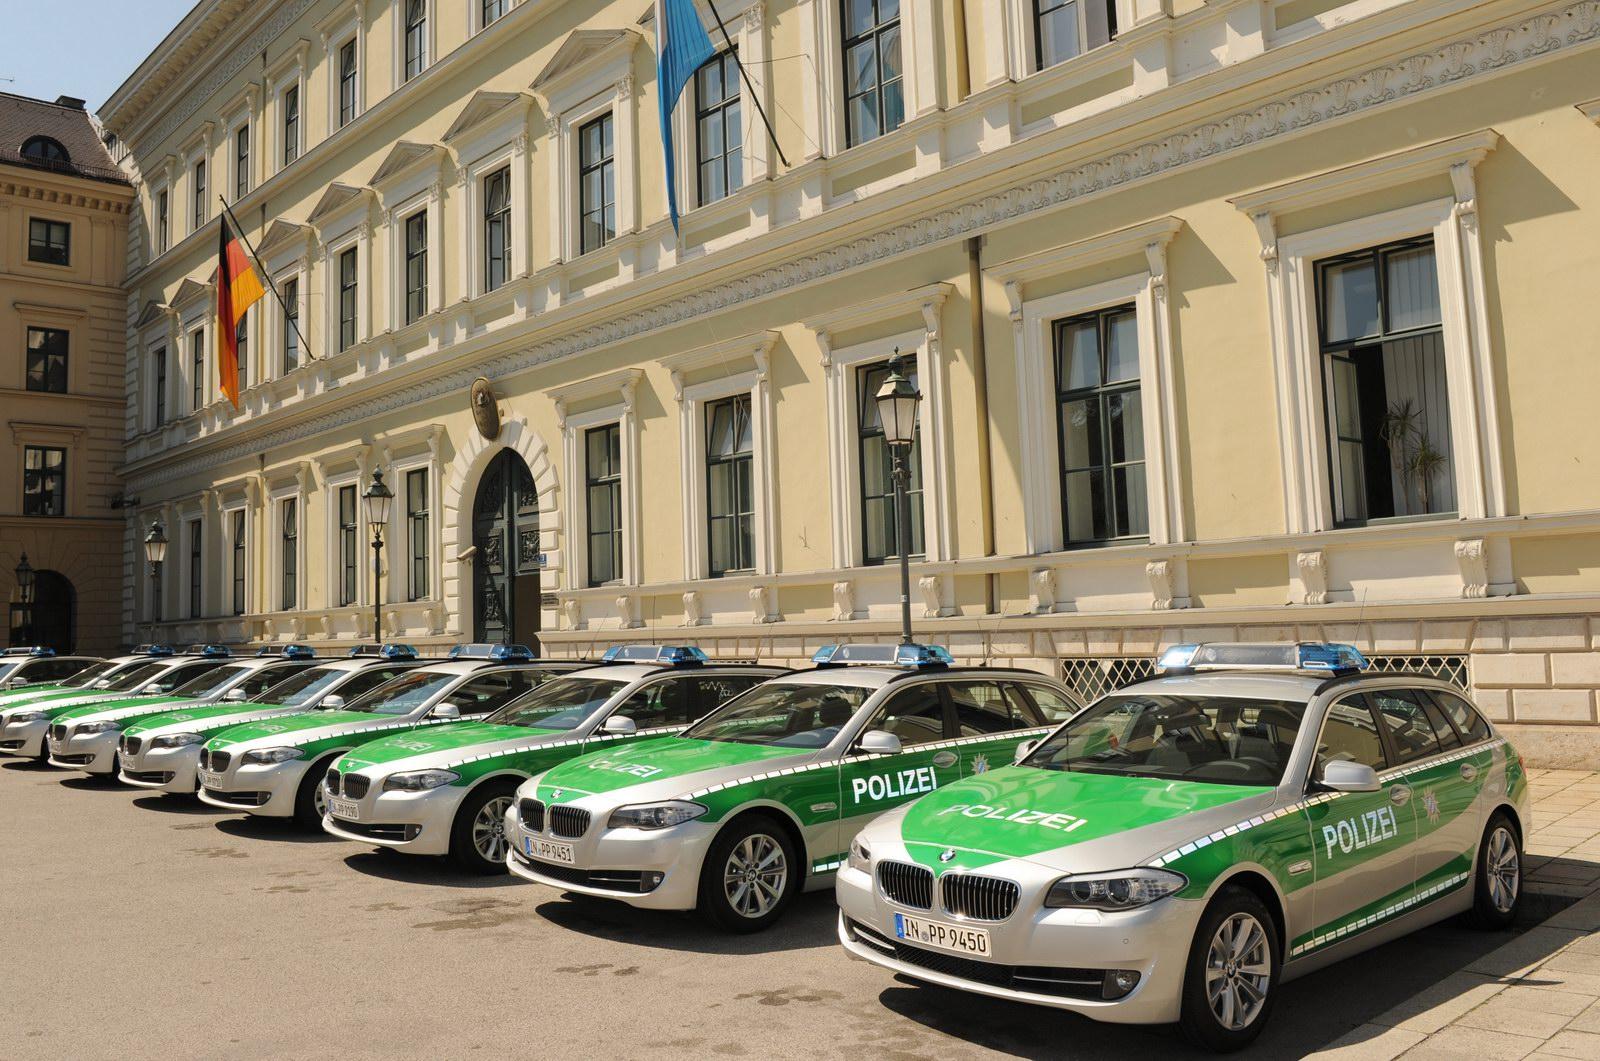 BMW 5 Series Touring fleet